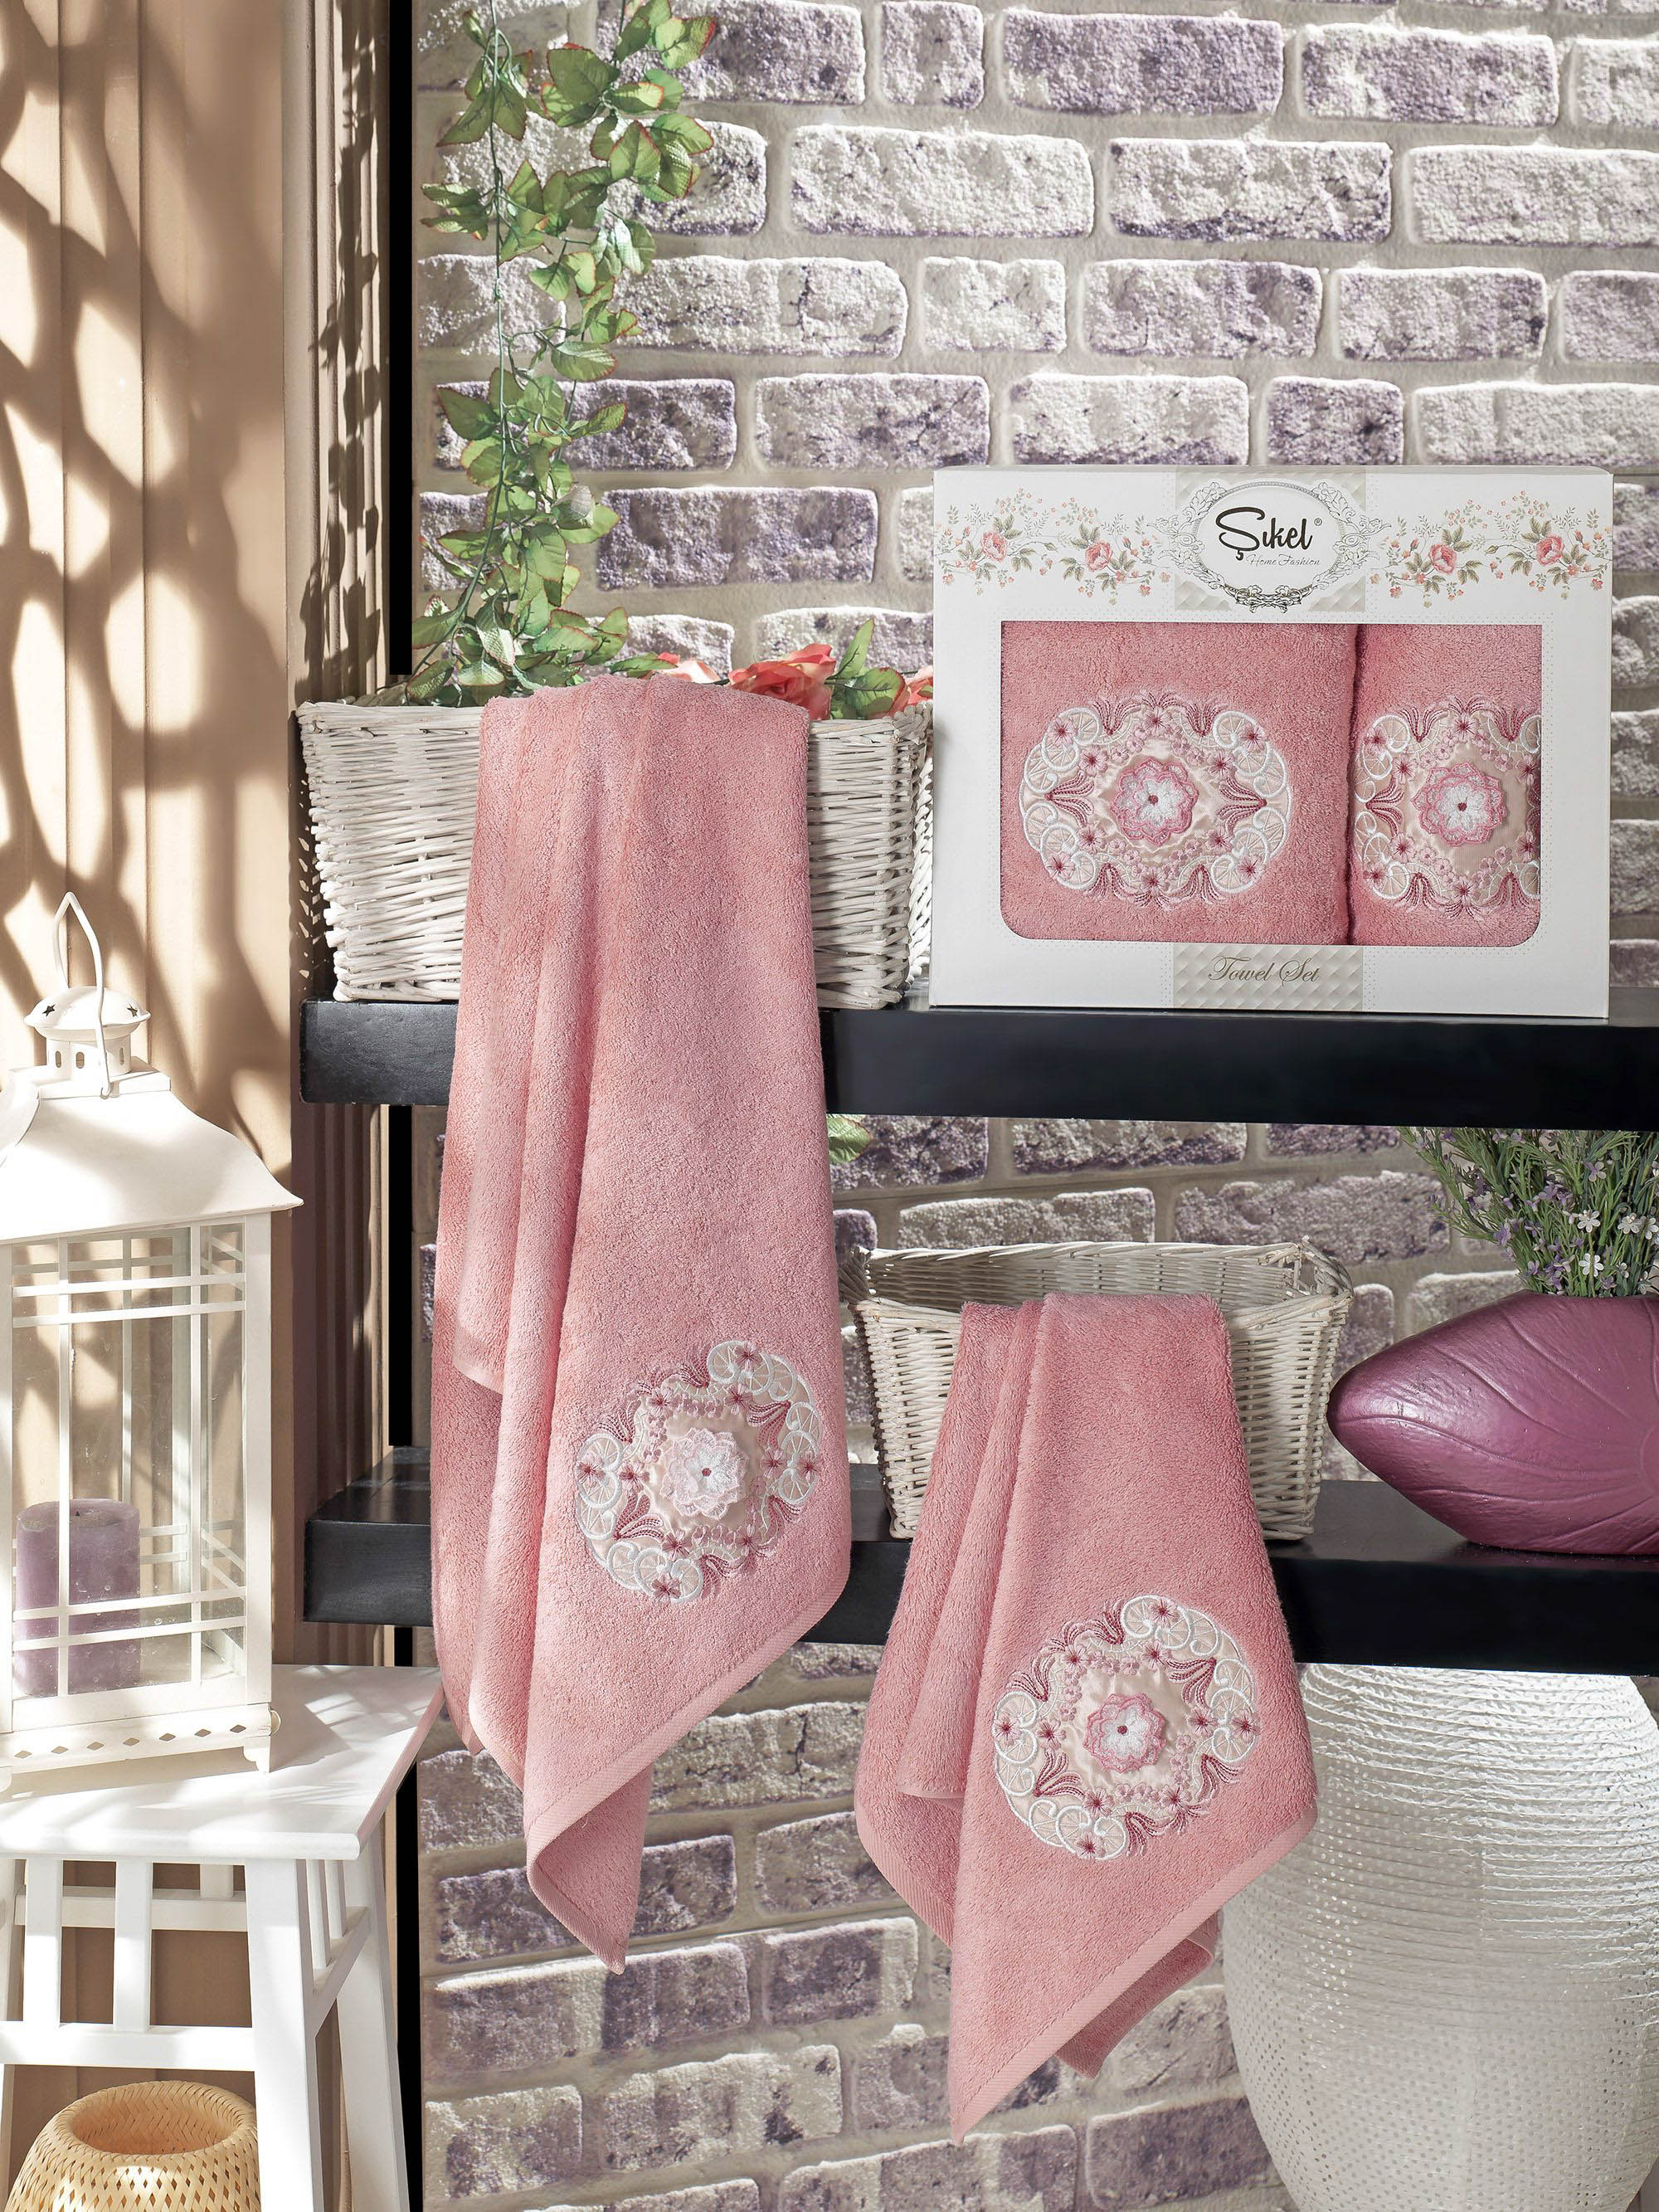 Полотенца Sikel Набор из 2 полотенец Kamelya Цвет: Пудра набор из 3 полотенец merzuka sakura 50х90 2 70х140 8432 терракотовый